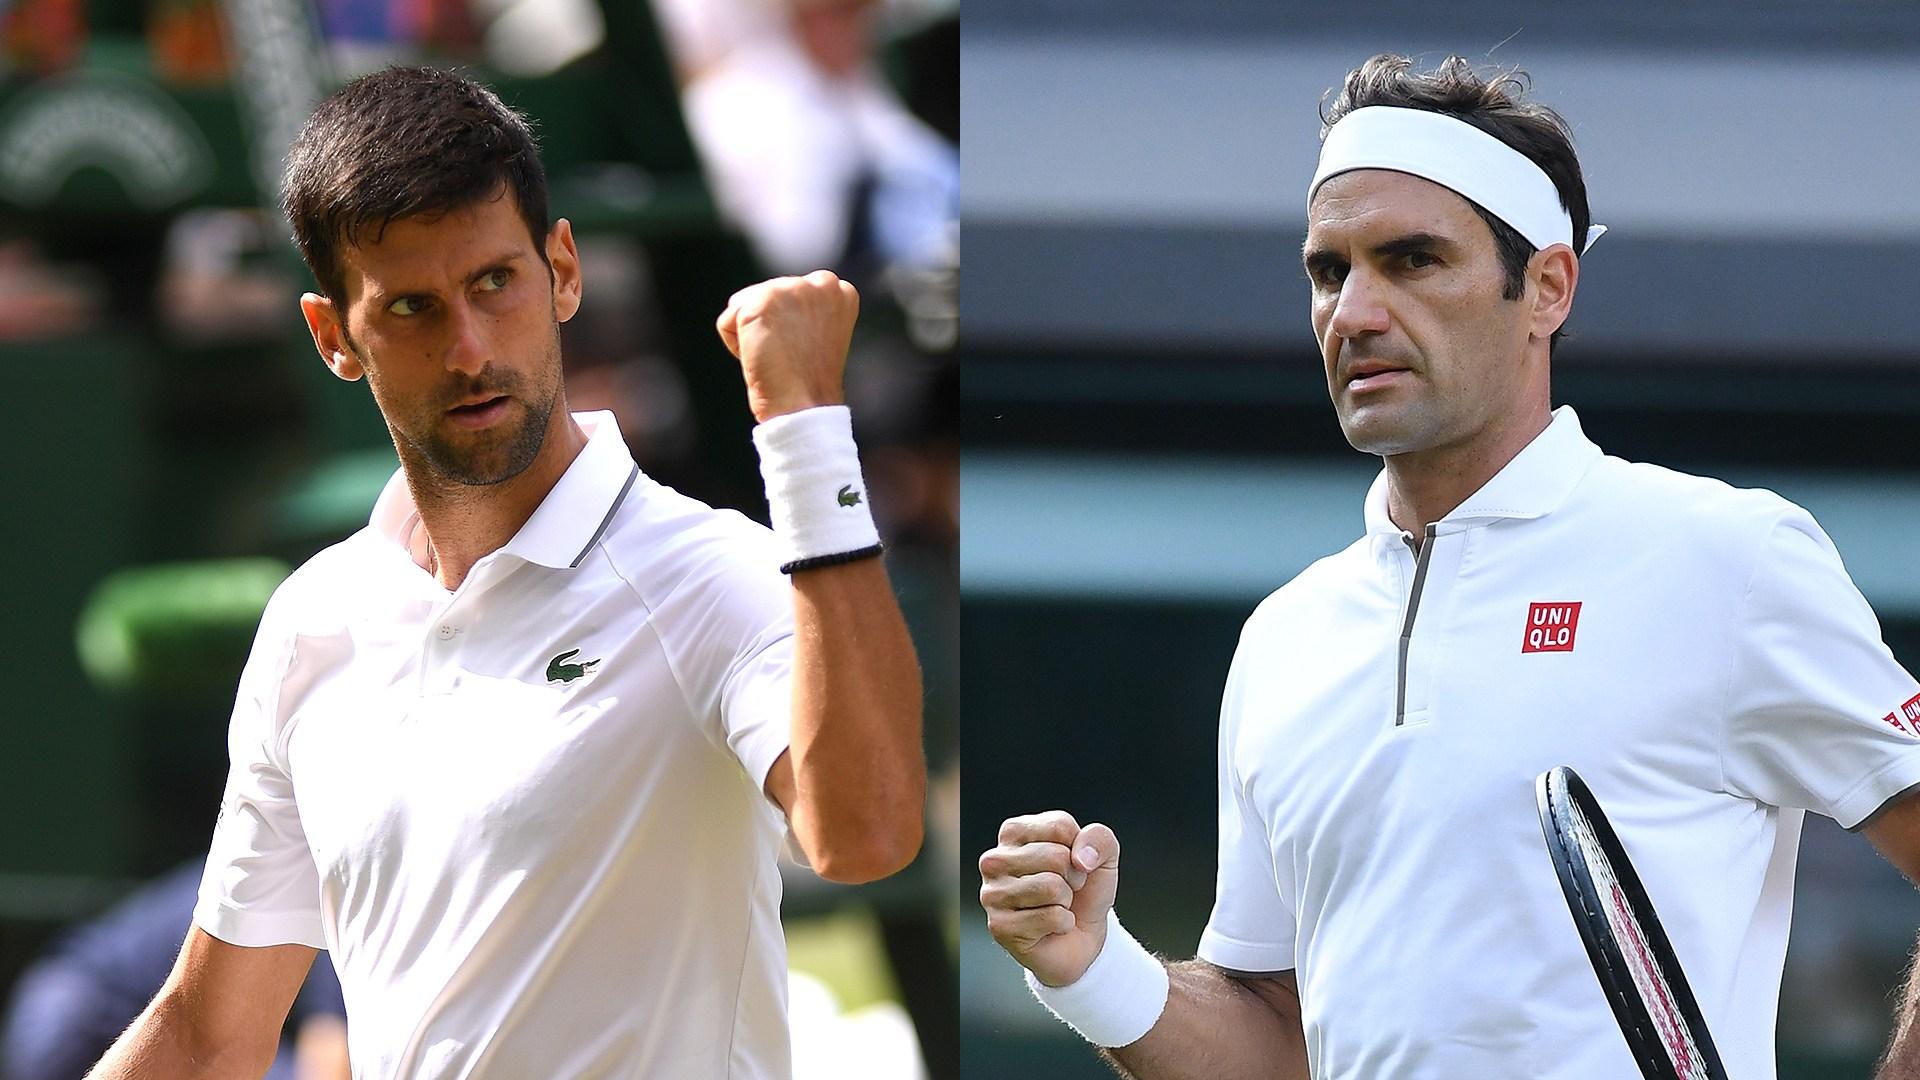 Fotó: tennis.com